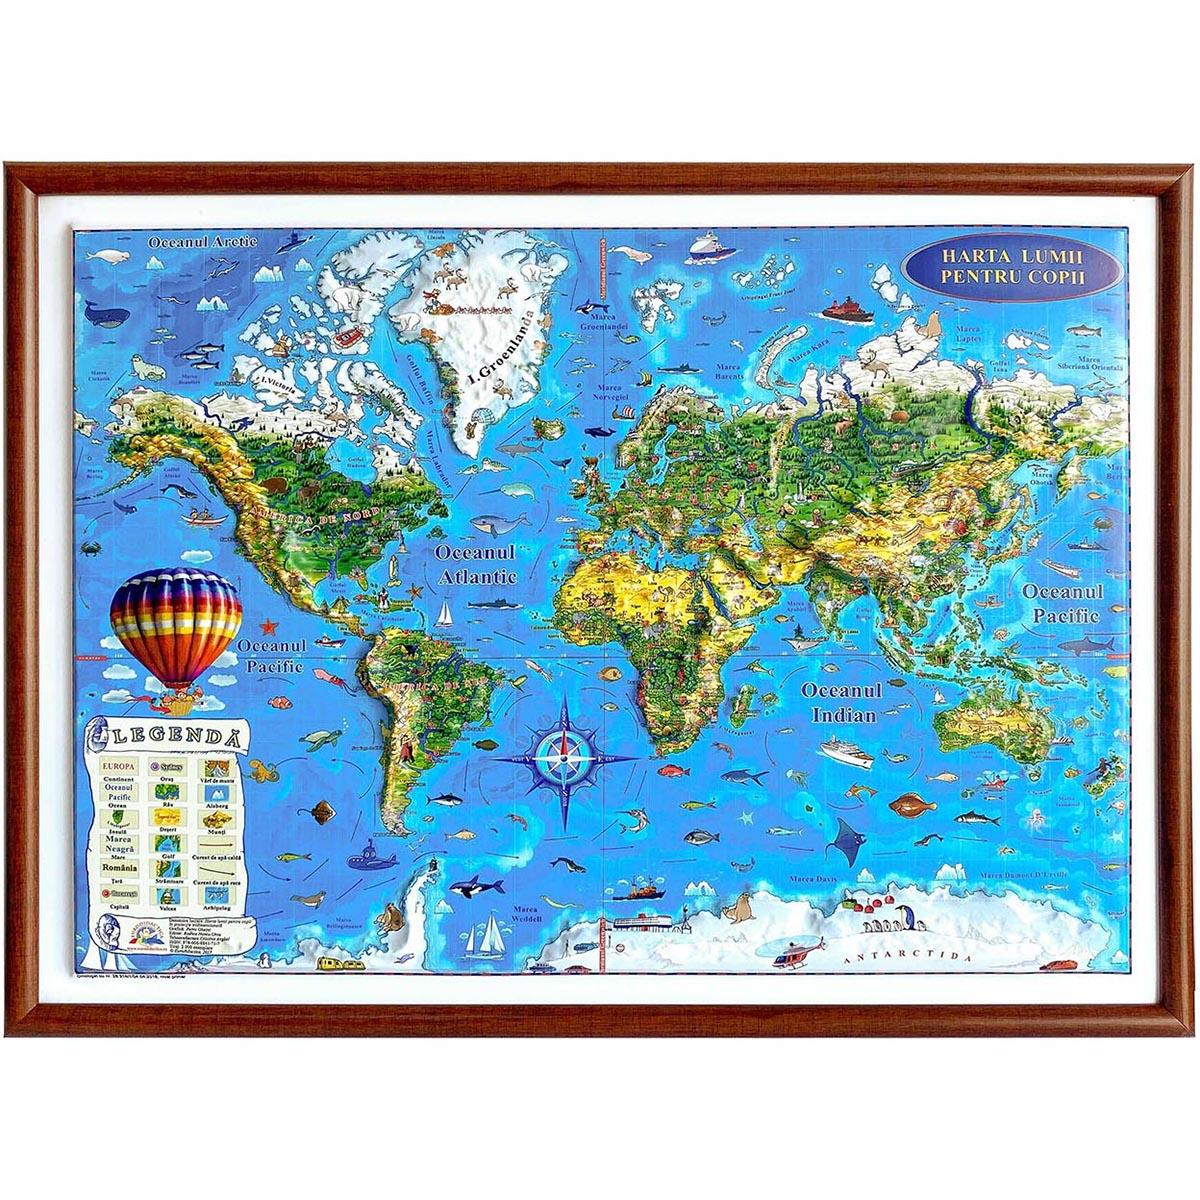 Harta Lumii pentru copii Eurodidactica 3D imagine